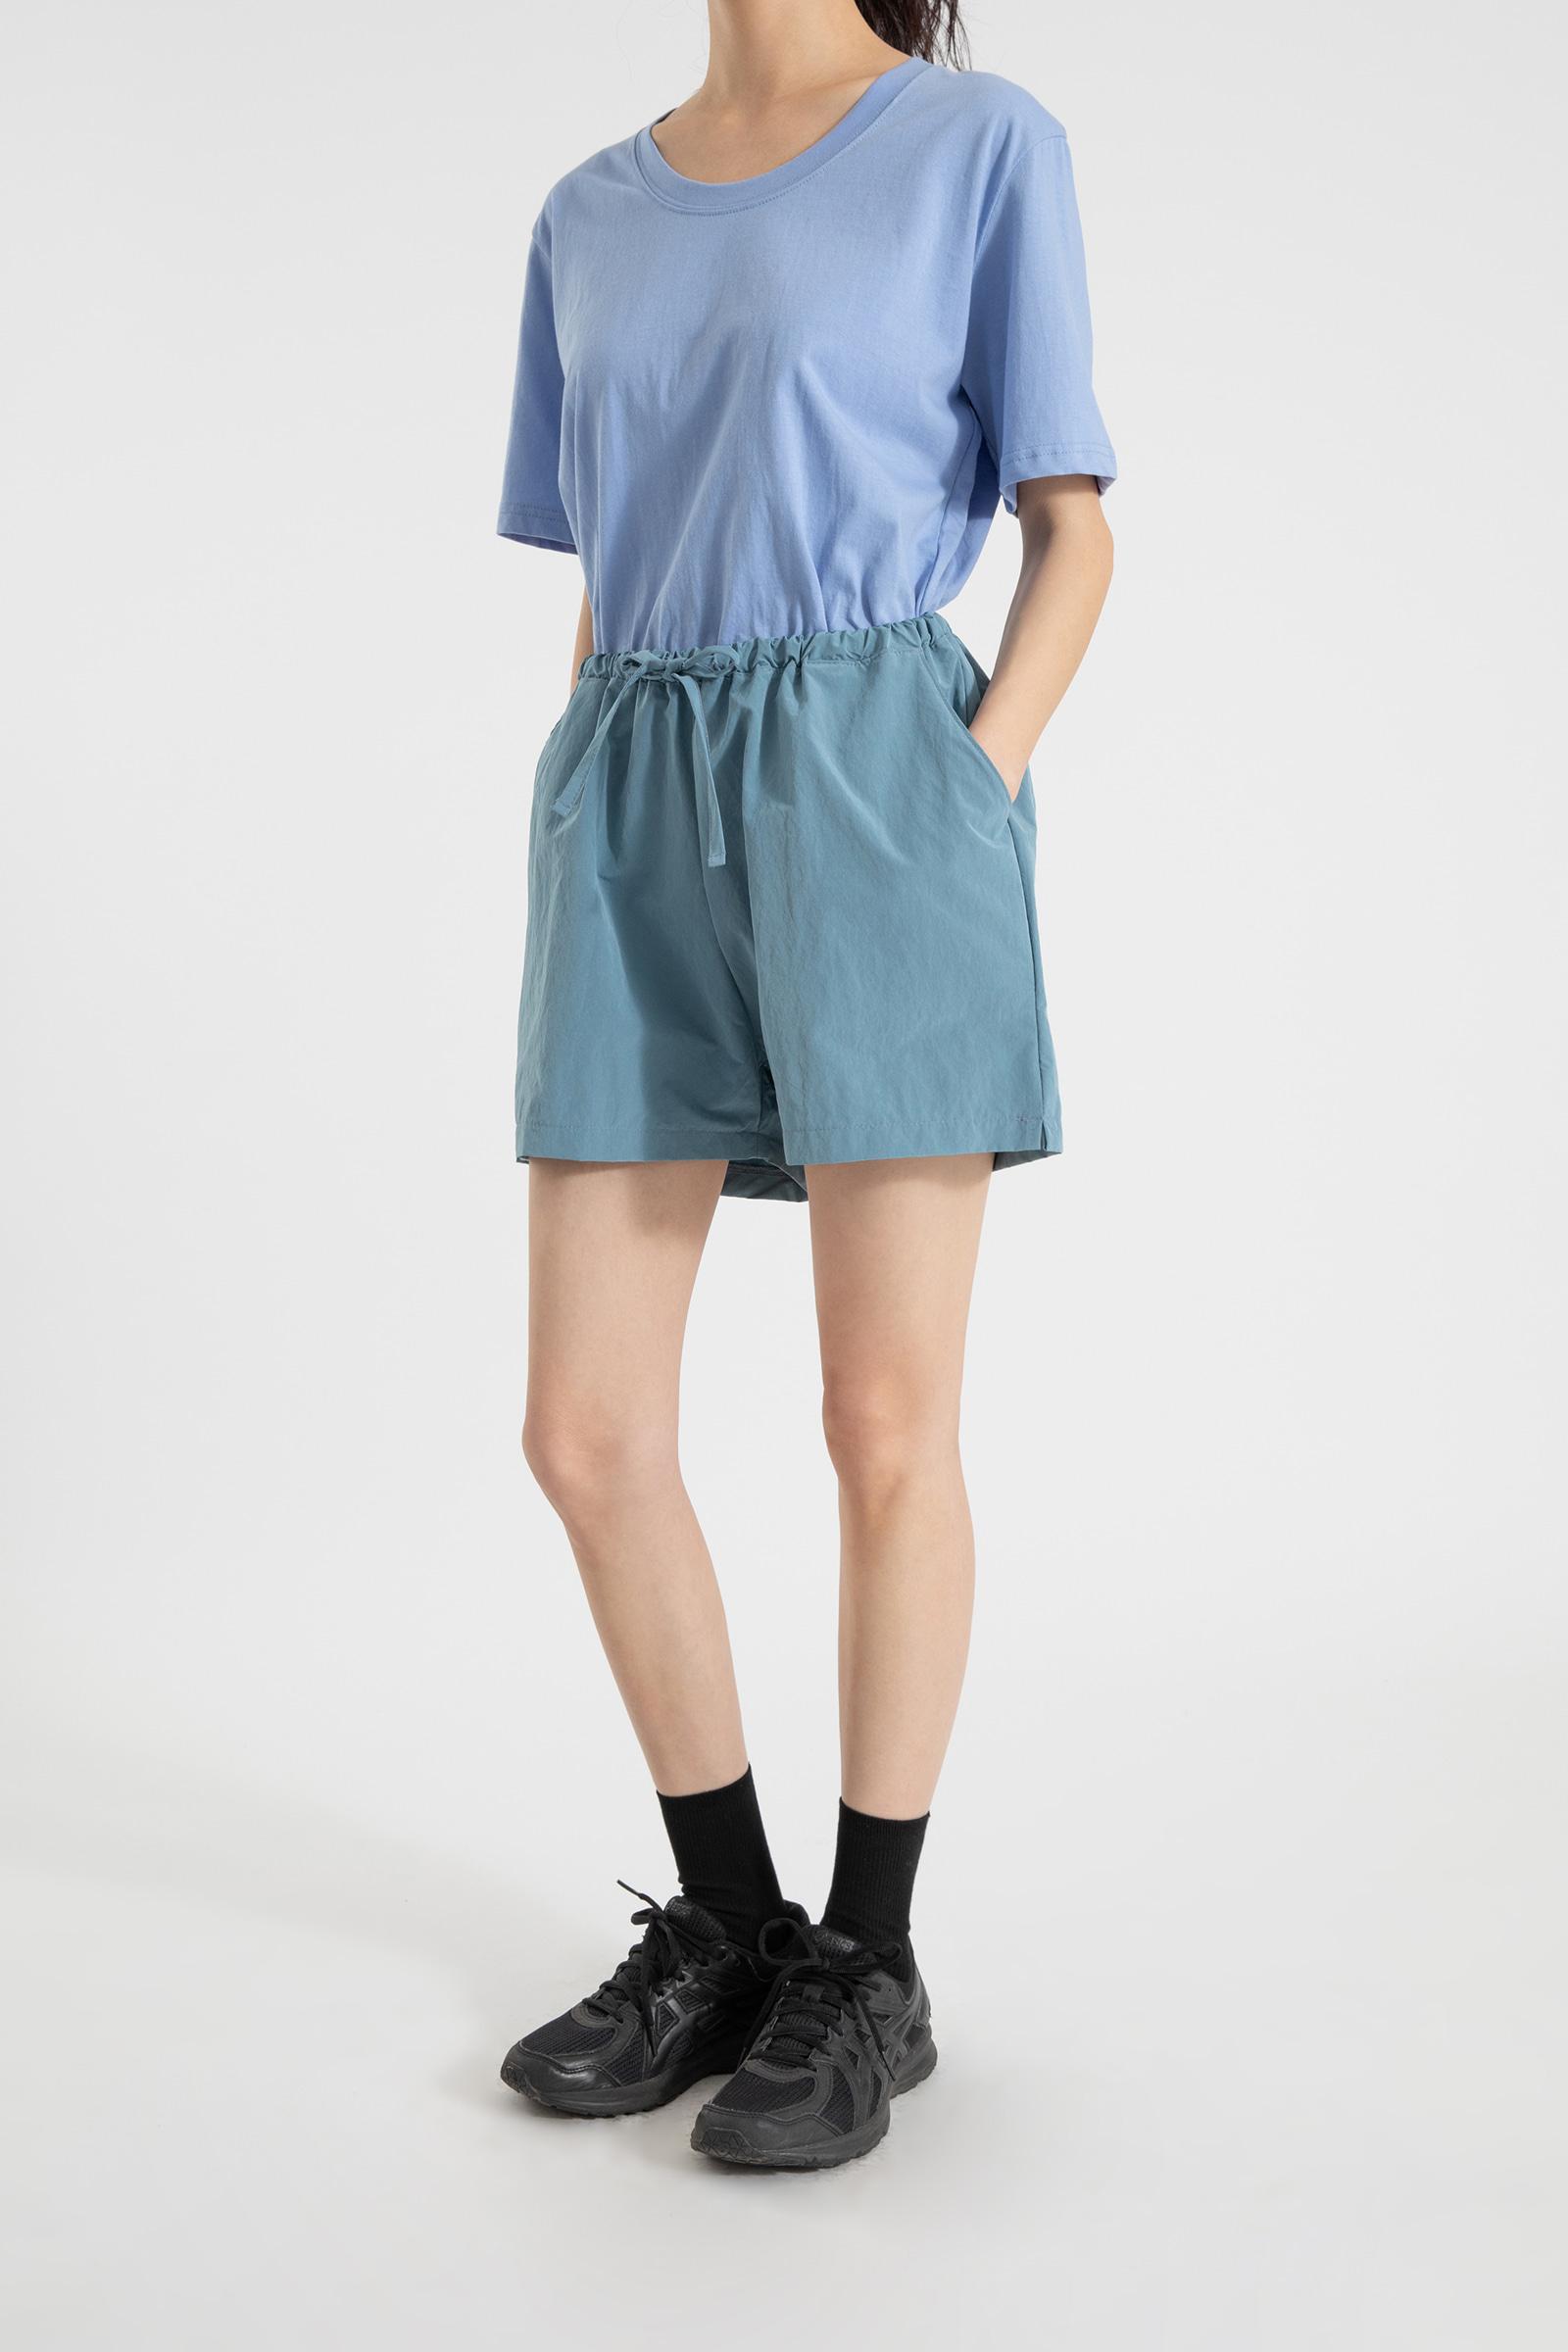 Crispy wide training shorts